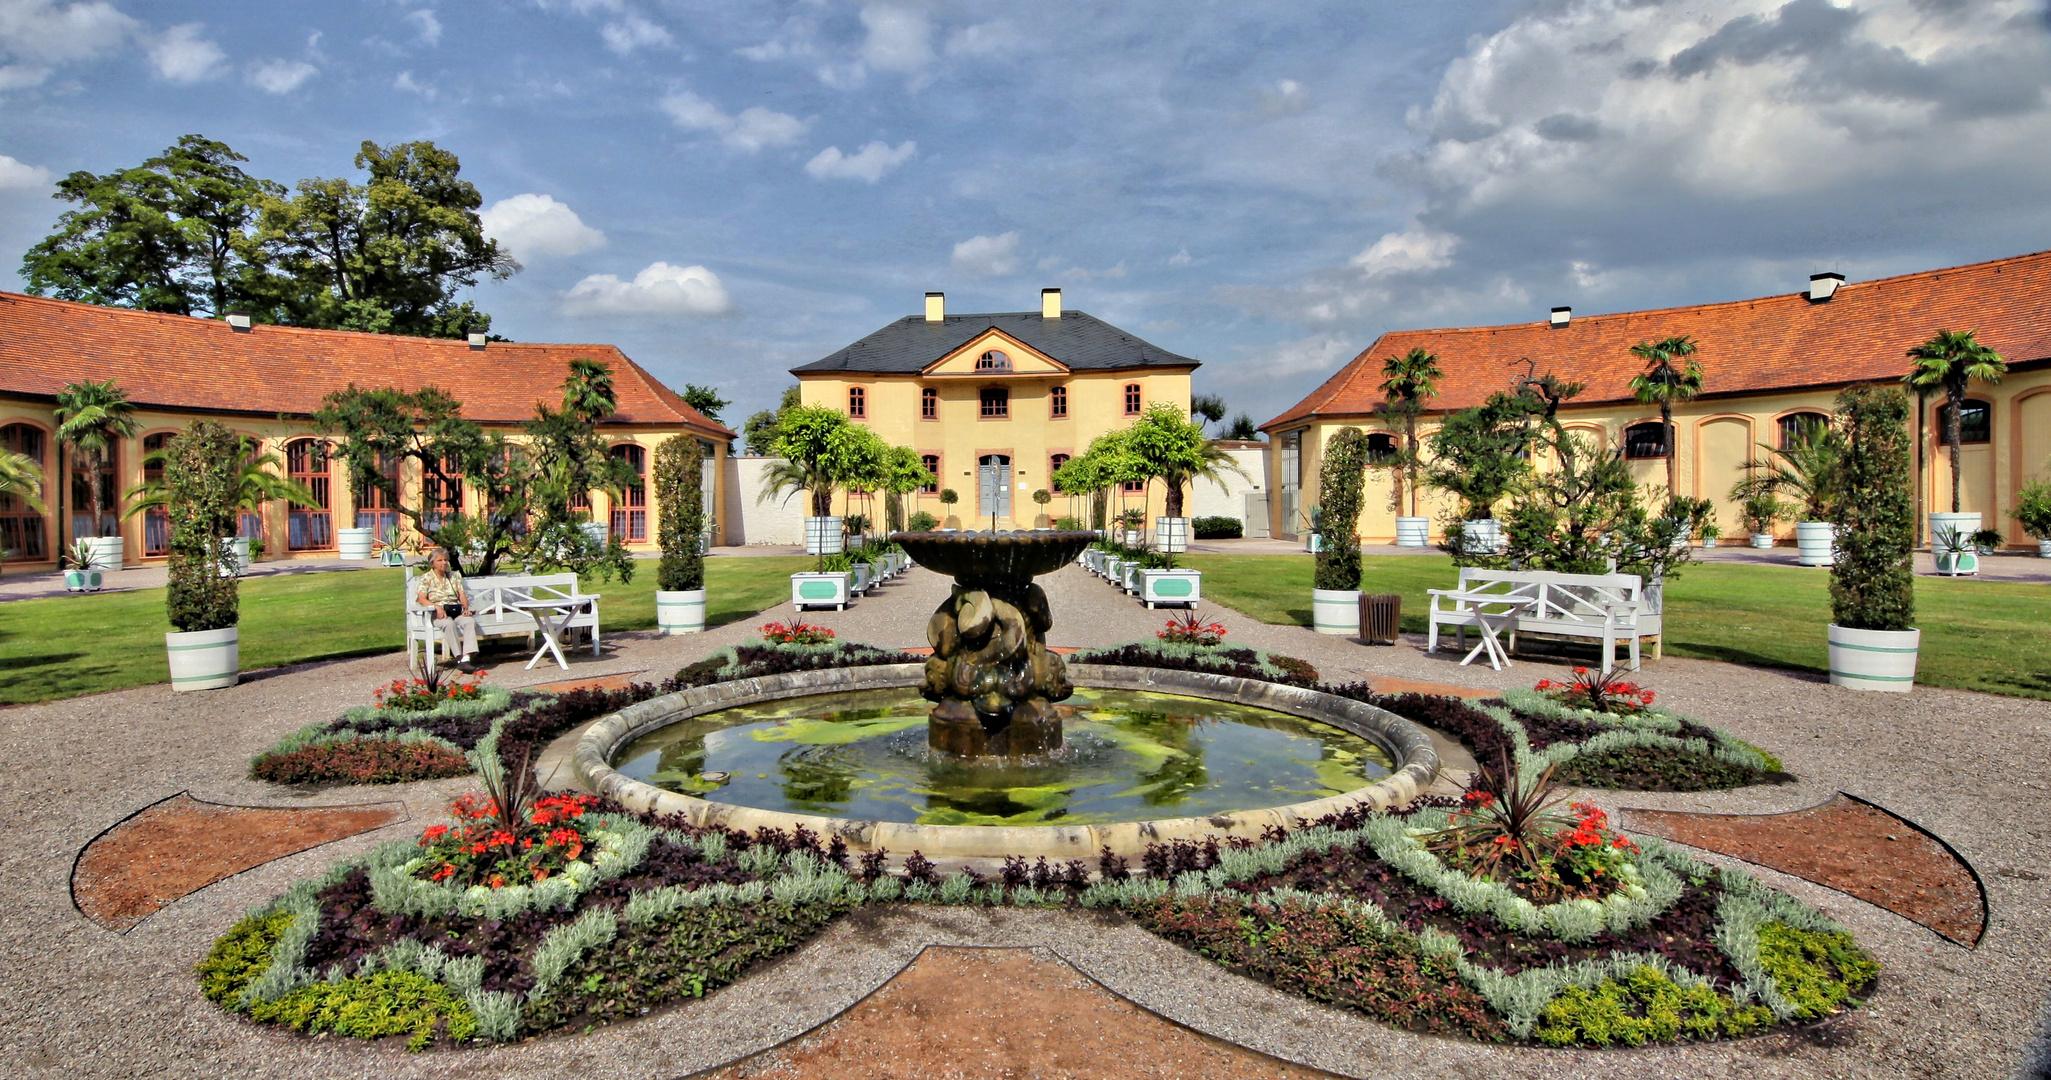 Schloss Belvedere Weimar - Orangerie